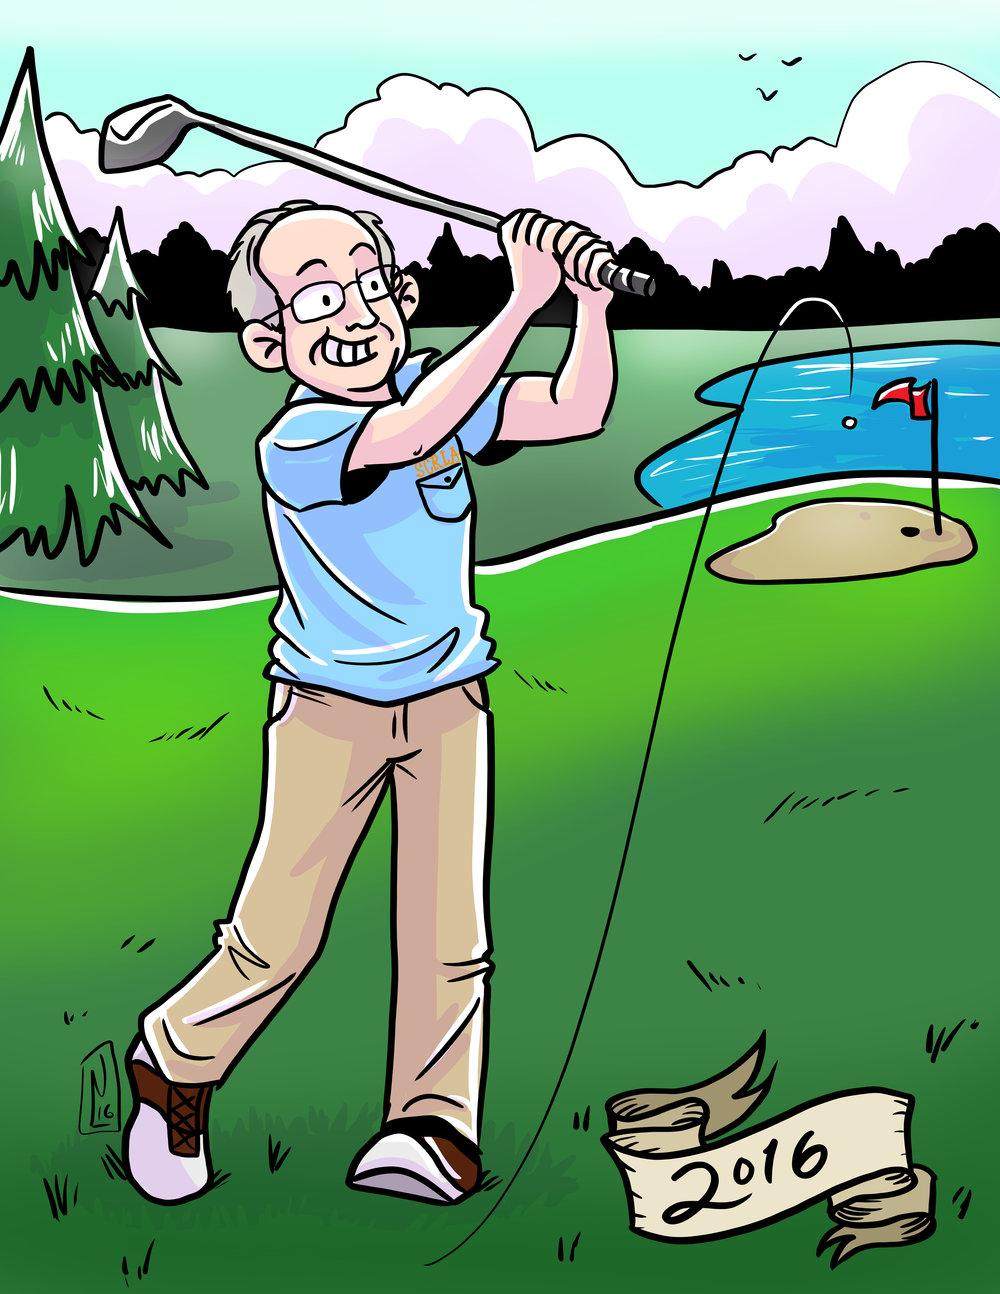 golf boss.jpg